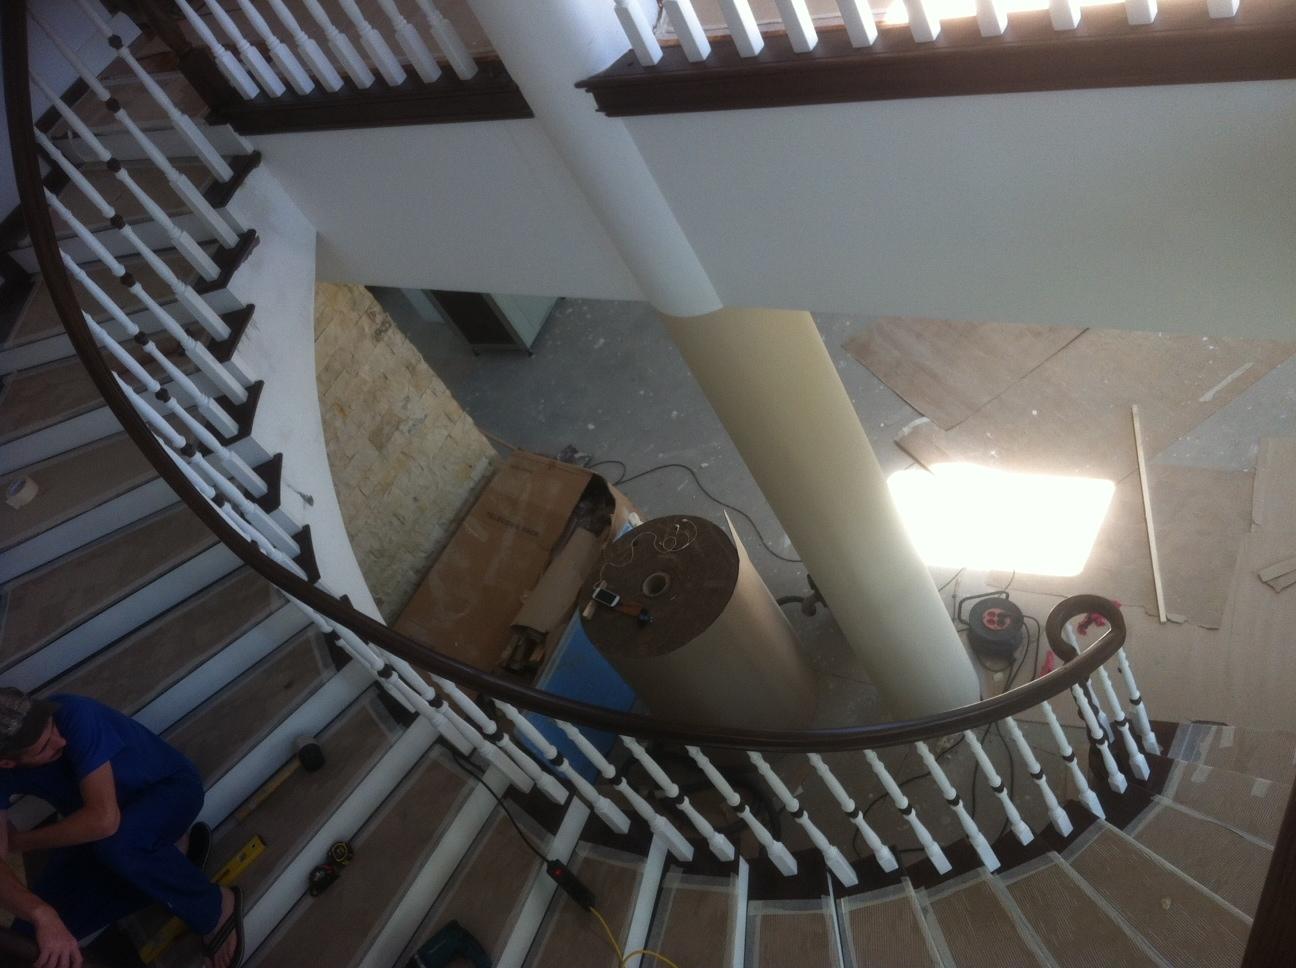 Trepte si Balustrada din lemn - Scara din beton realizata pe curb TURSO HOLZ - Poza 10